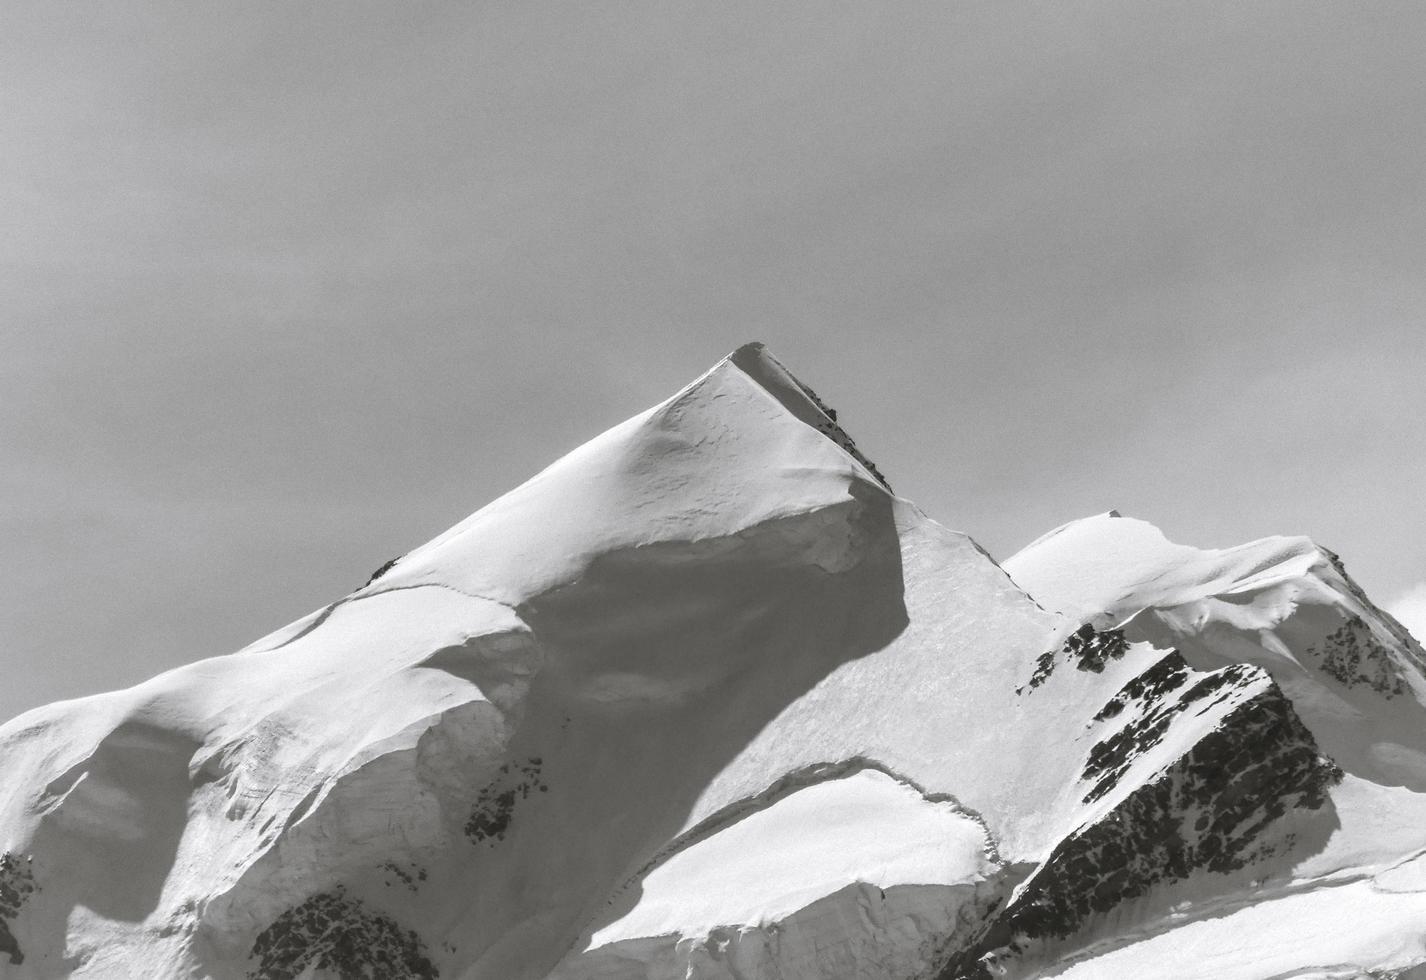 Snowy Mountain Peak photo